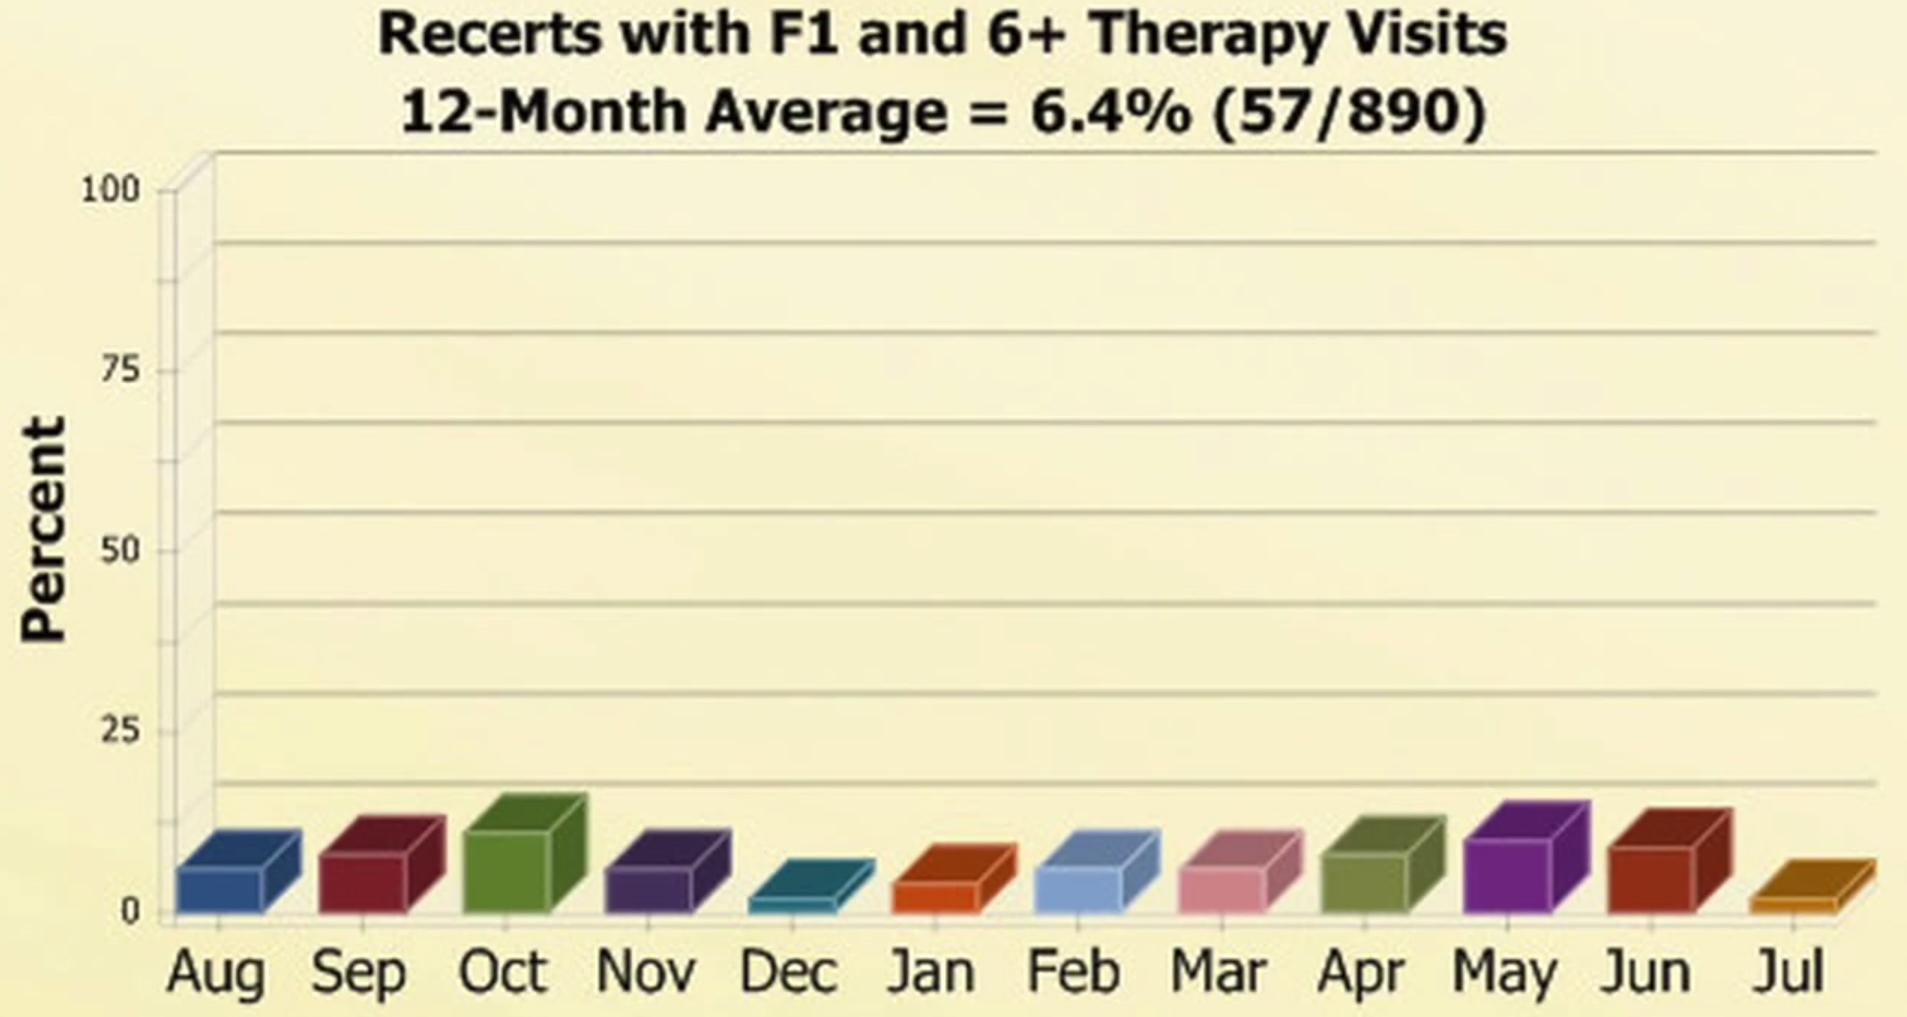 Data chart